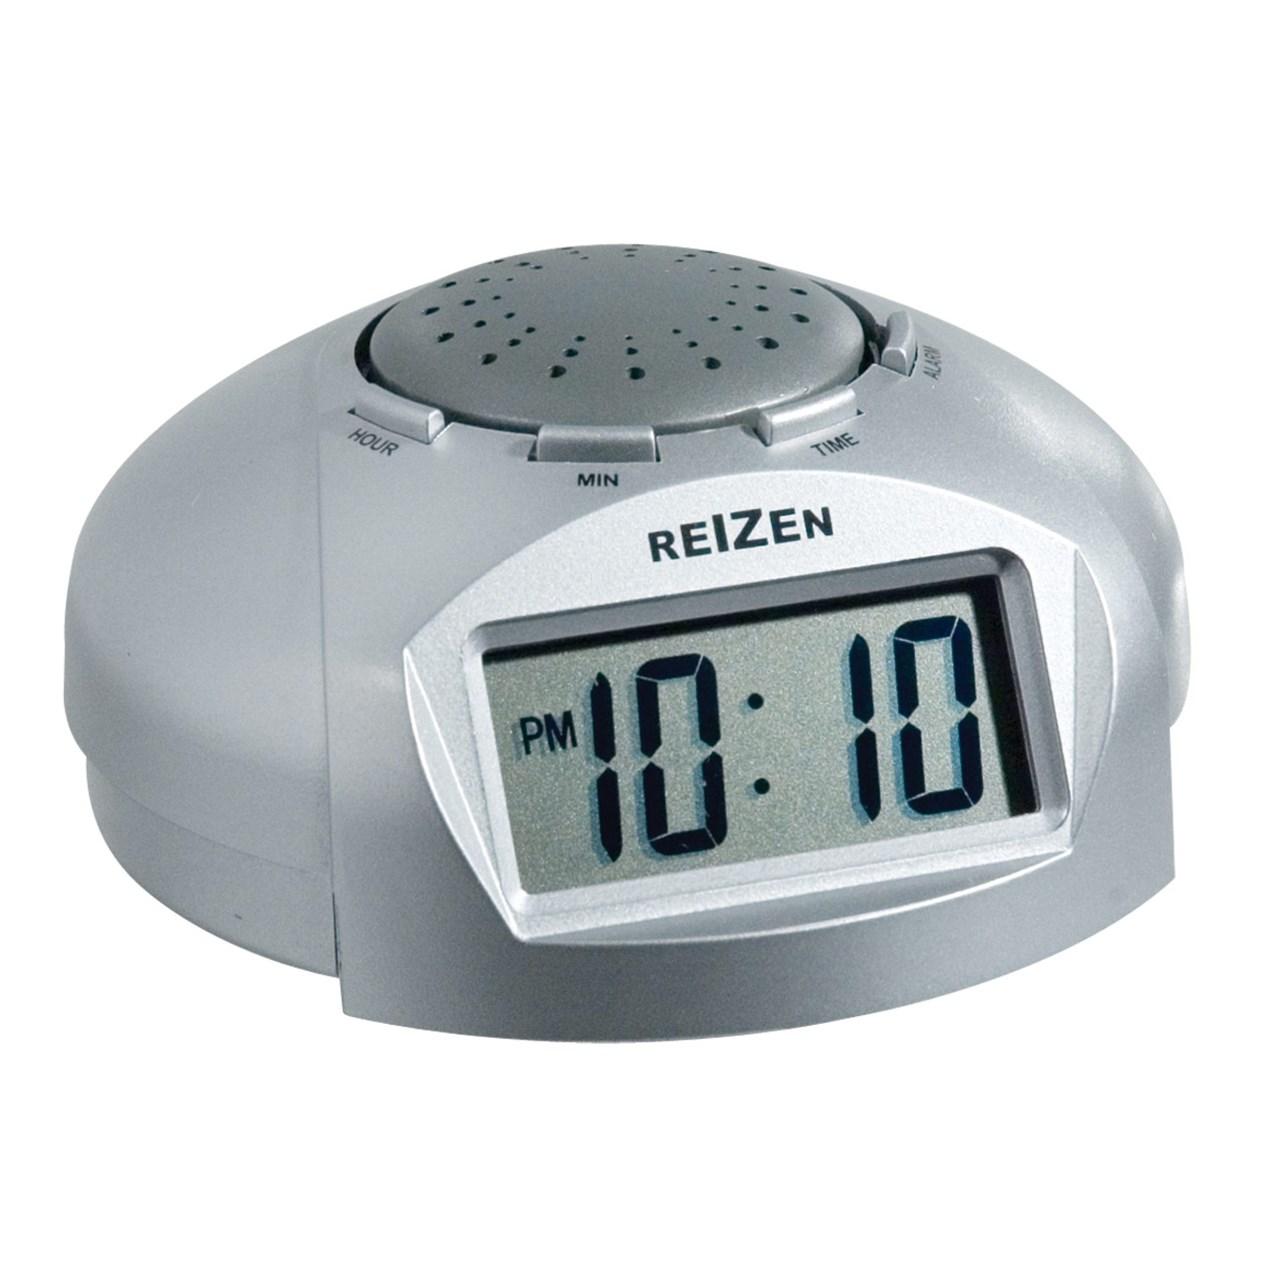 Maxiaids Reizen Big Lcd Display Talking Alarm Clock